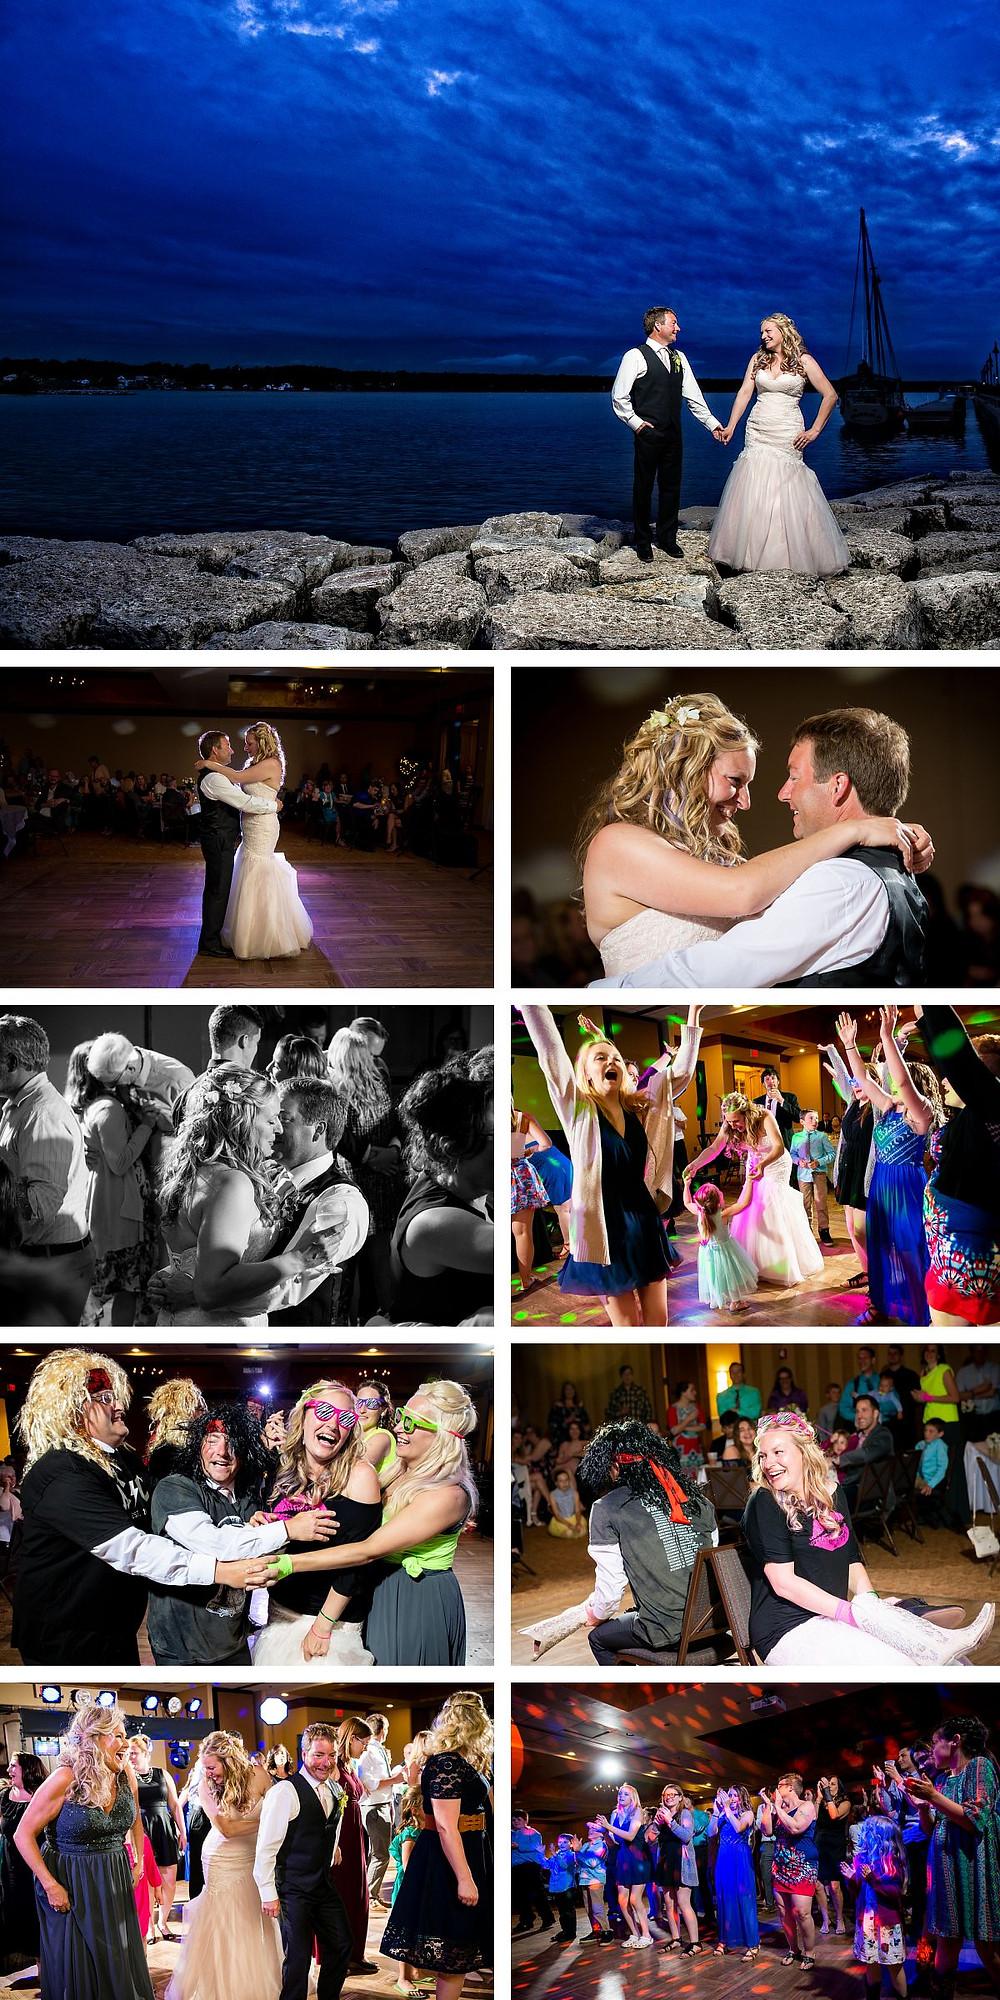 Stone Harbor Door County Wedding Photographer Elite Music Service Lanari Photography